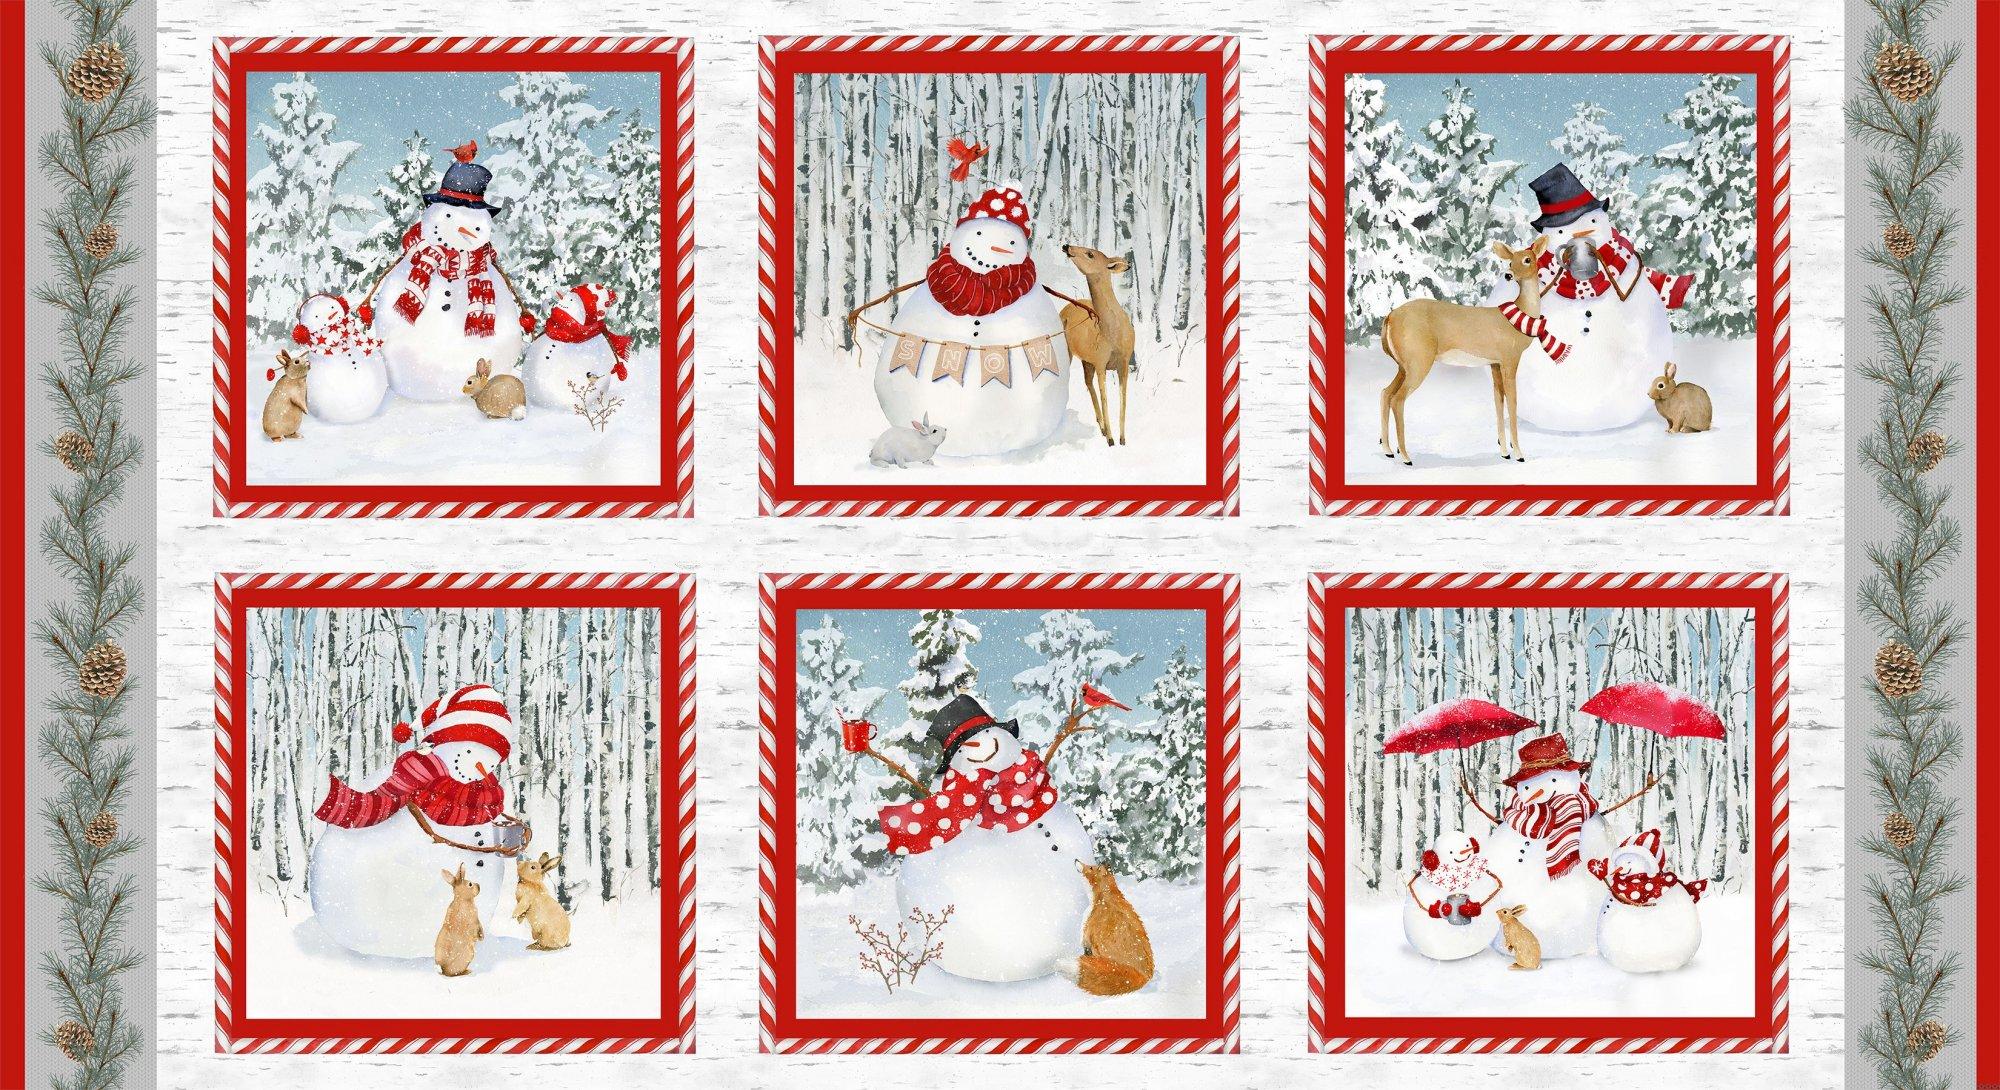 HG-Welcome Winter 9701-18 Multi - 24 Repeat of Six Snowman Blocks